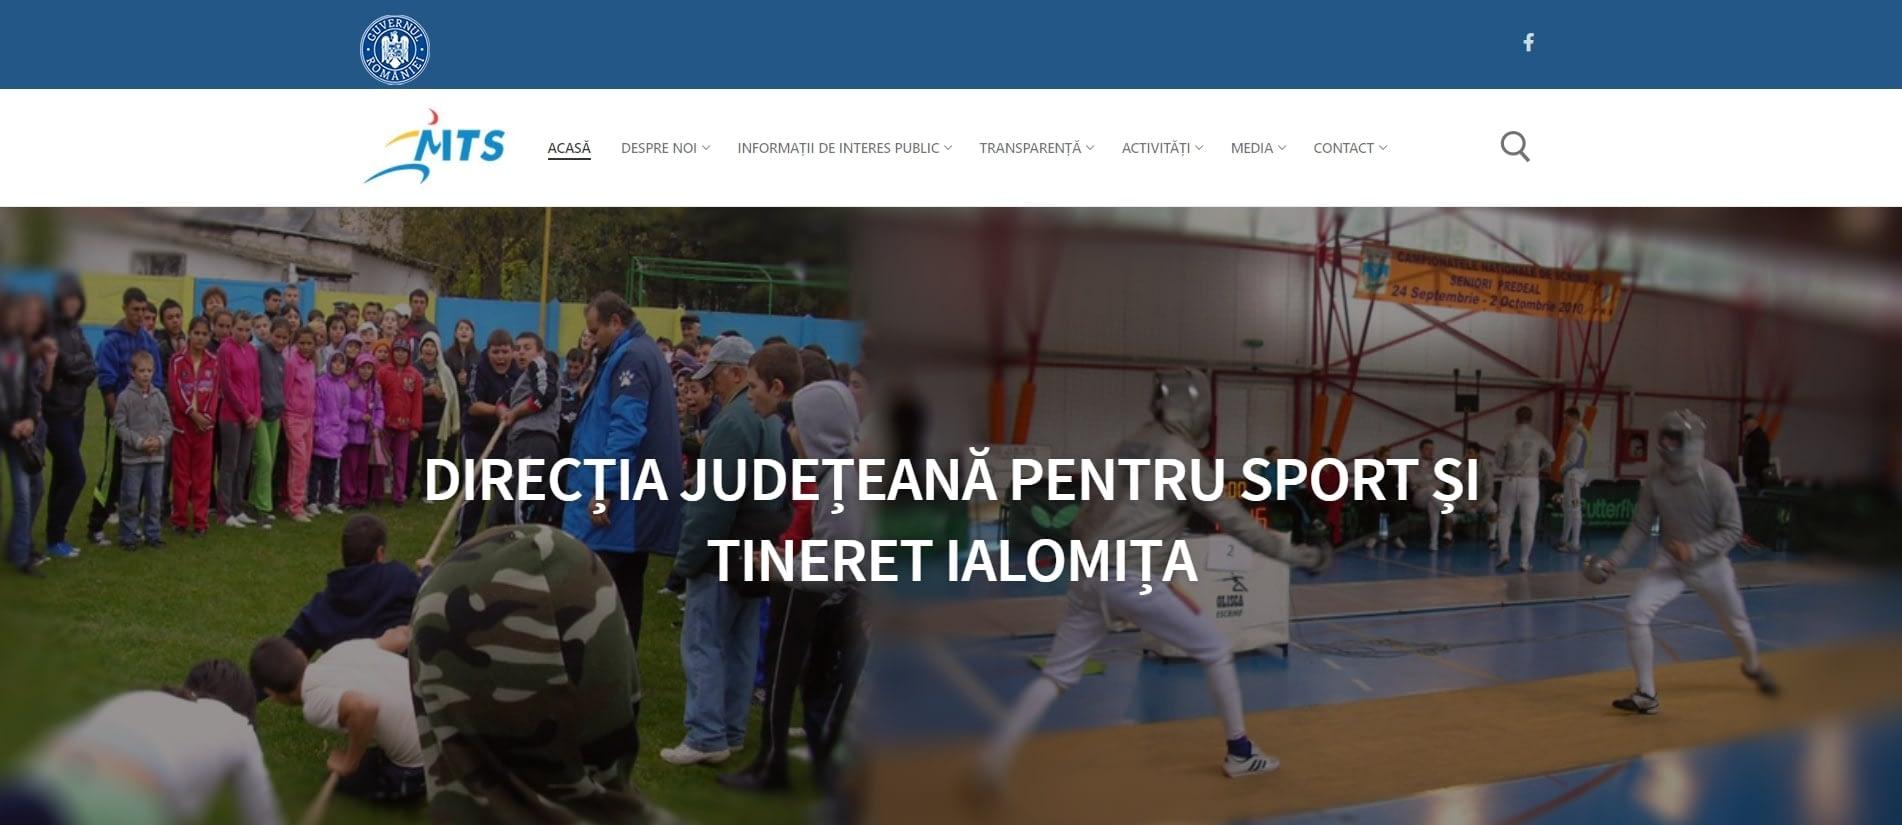 Site de prezentare DJST